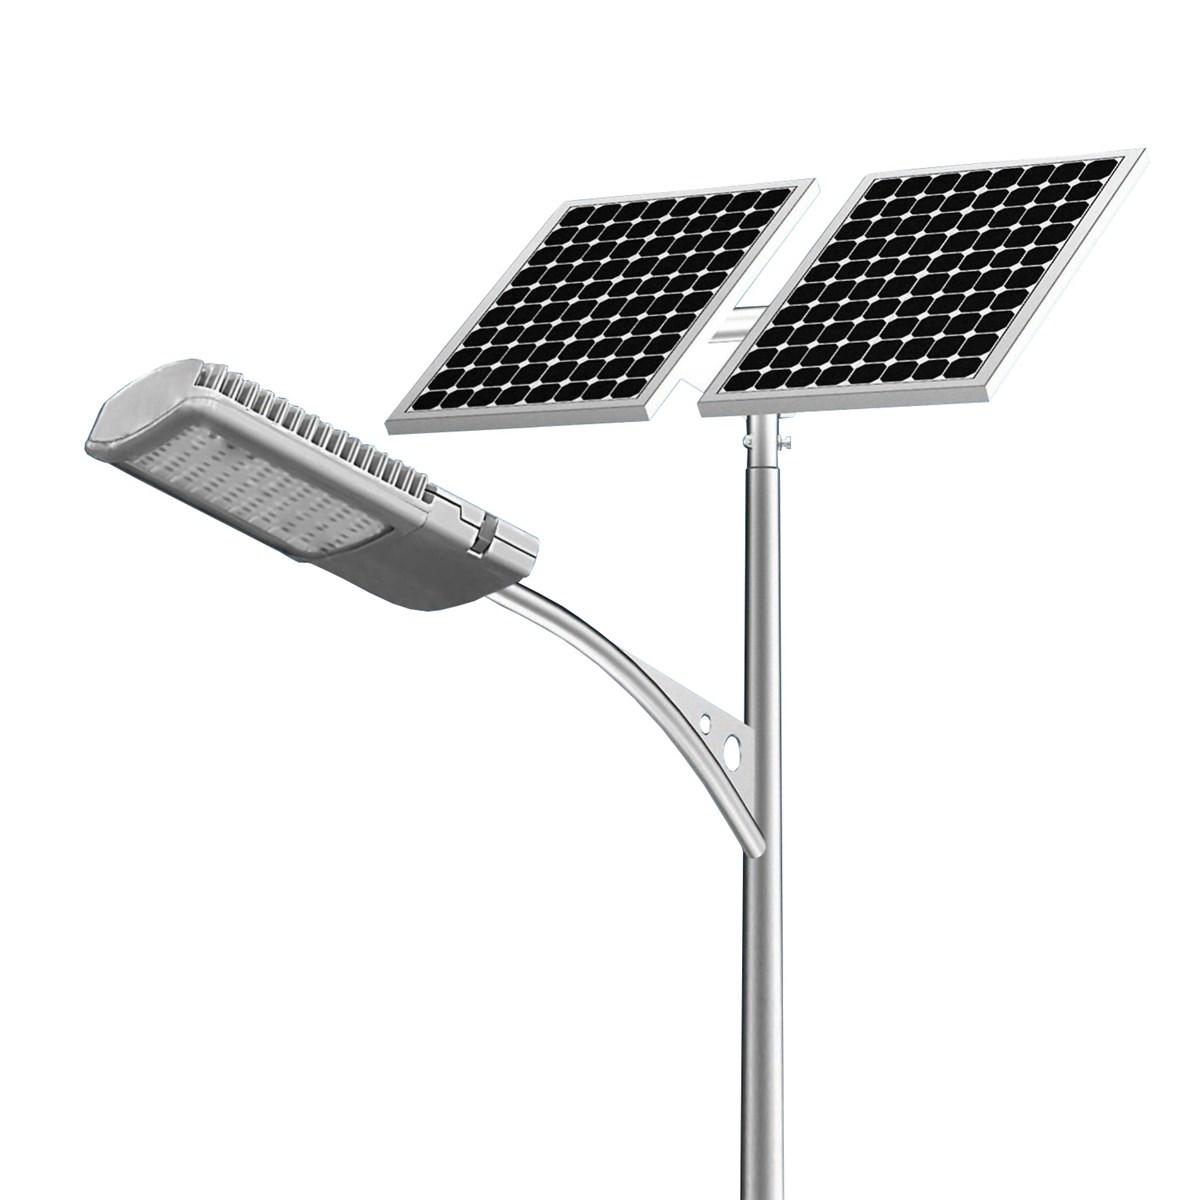 Solar Led Street Lighting Poles From Turkey Manufacturer